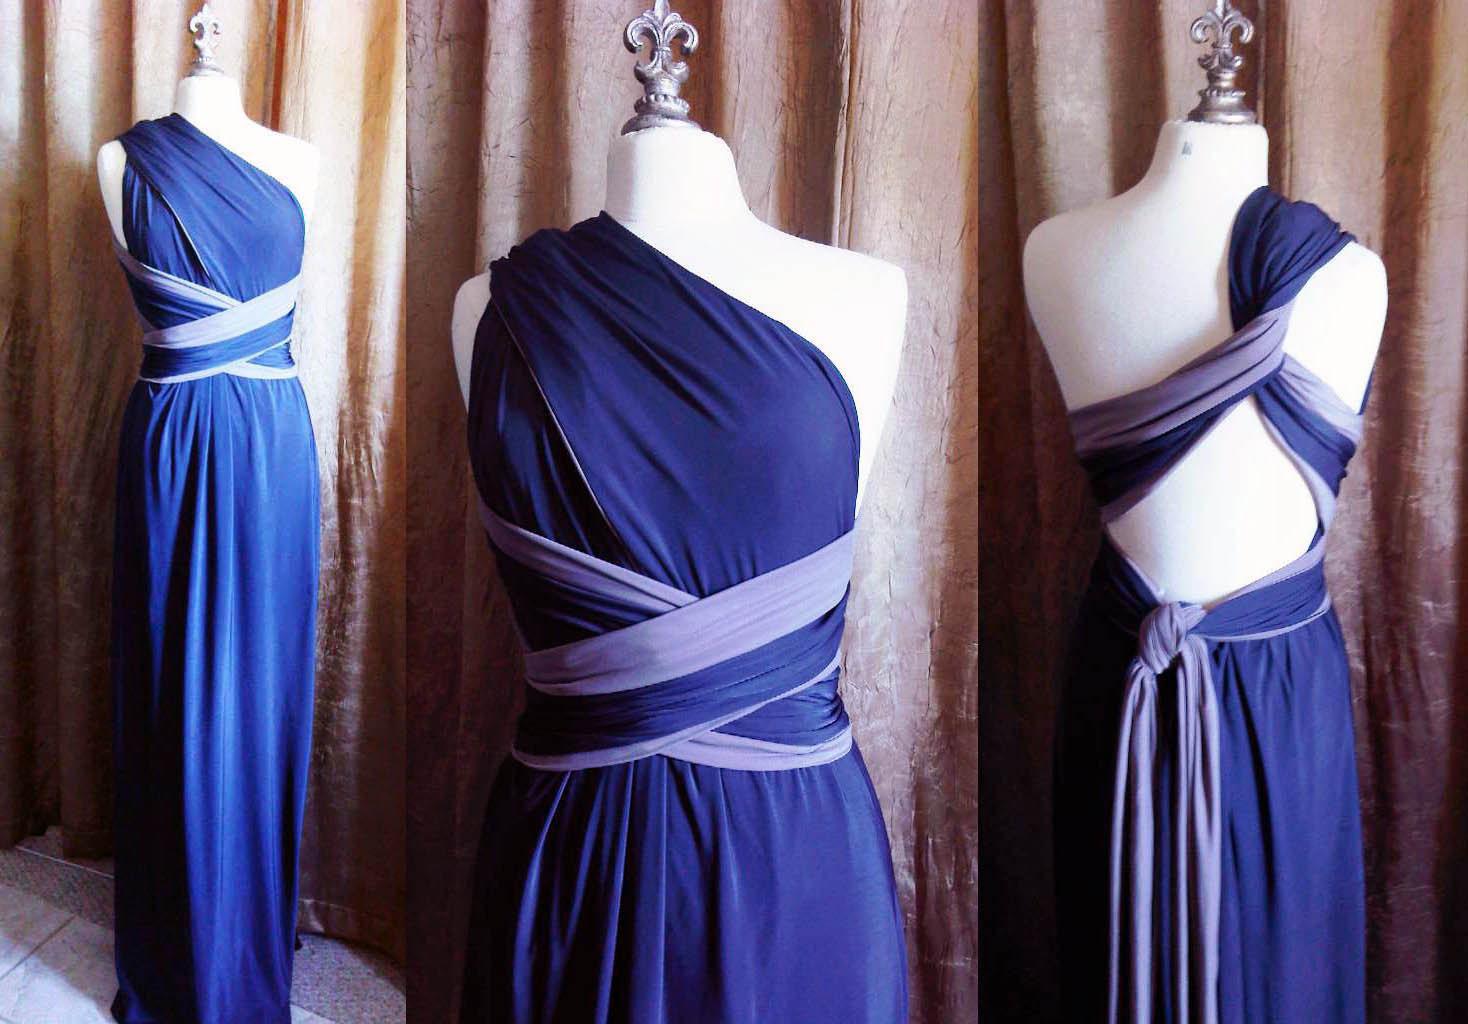 Bridesmaids, Bridesmaids Dresses, Fashion, blue, Inspiration board